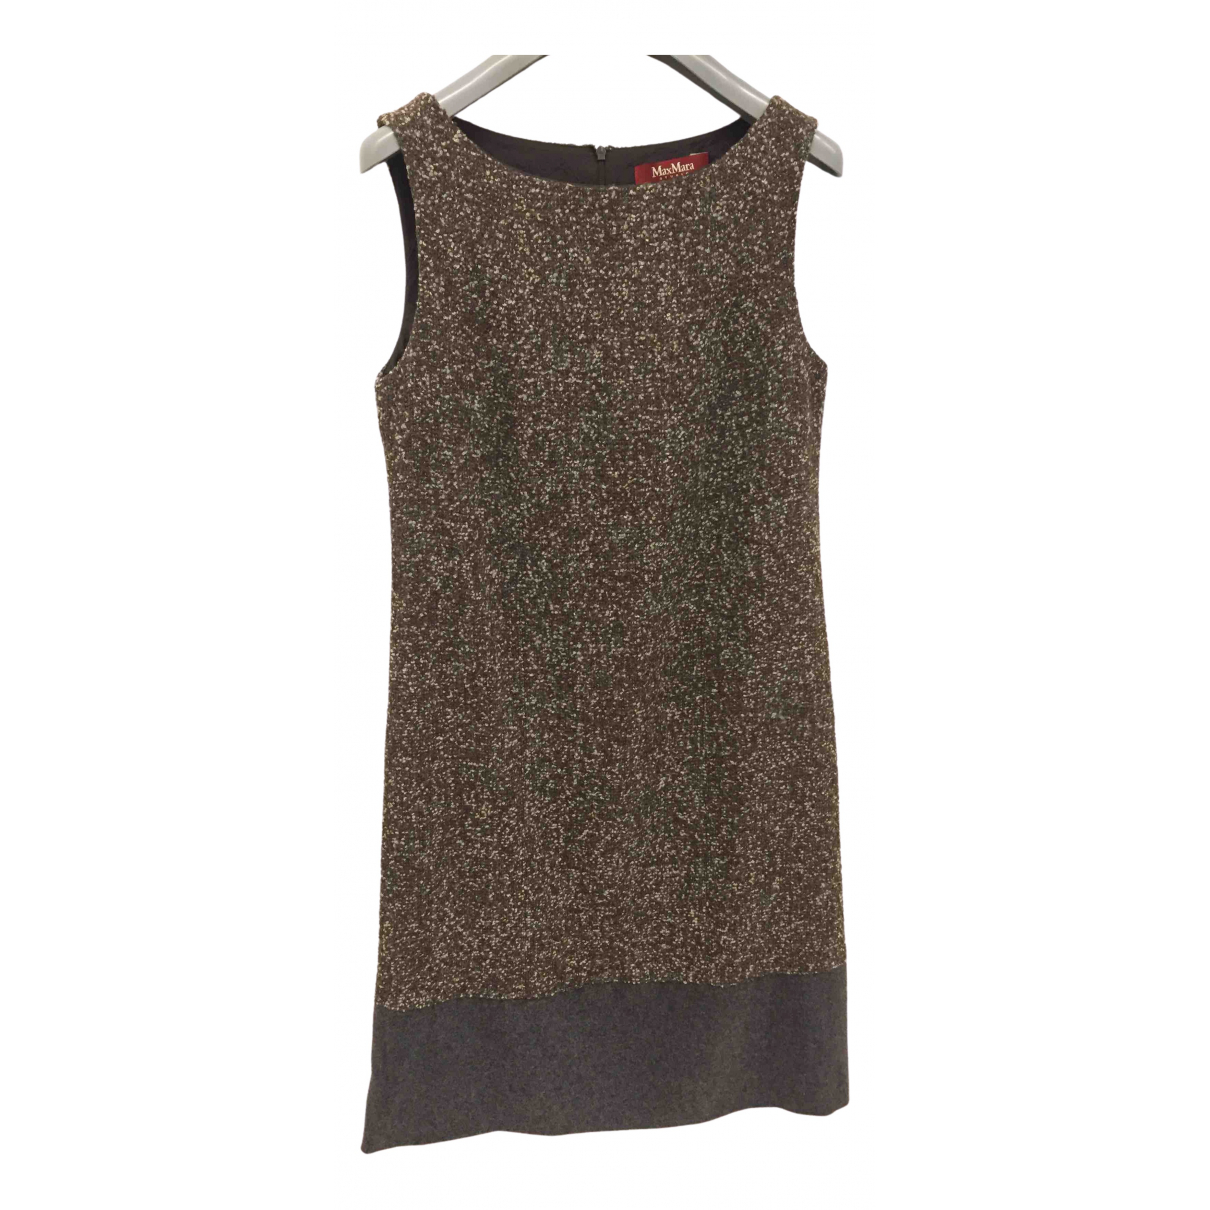 Max Mara Studio \N Multicolour Wool dress for Women 42 IT